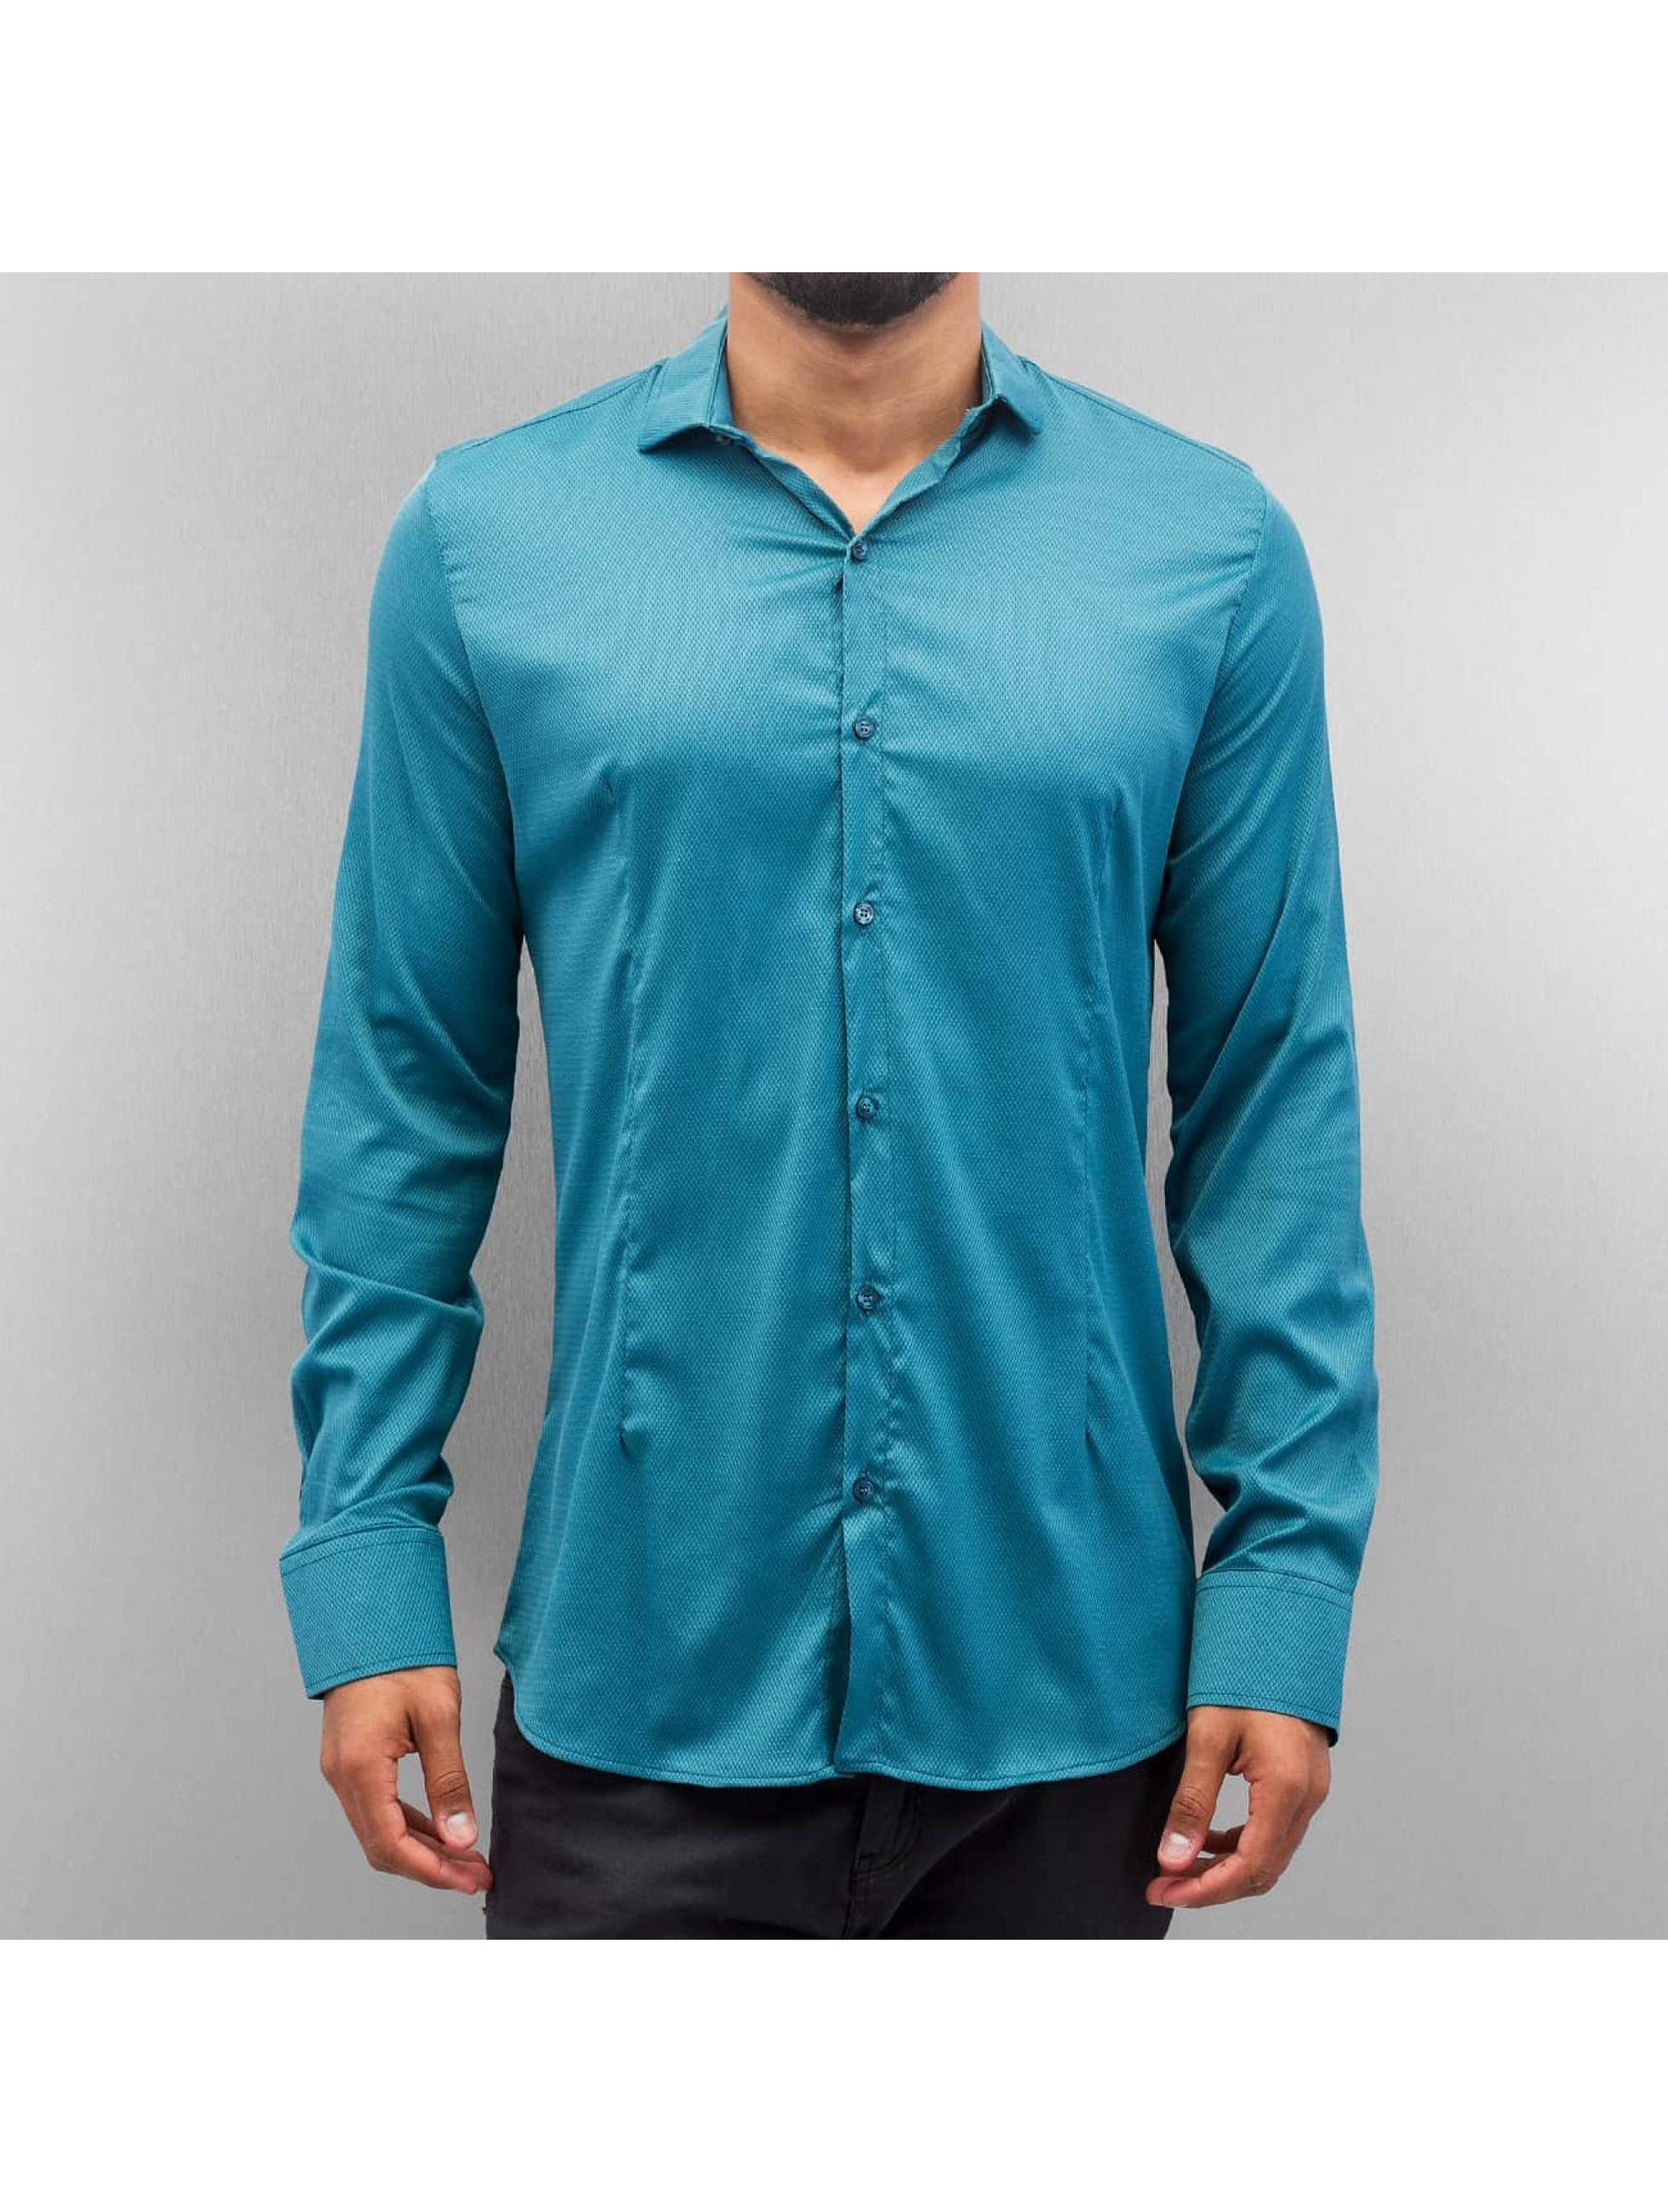 Open overhemd Rio turquois